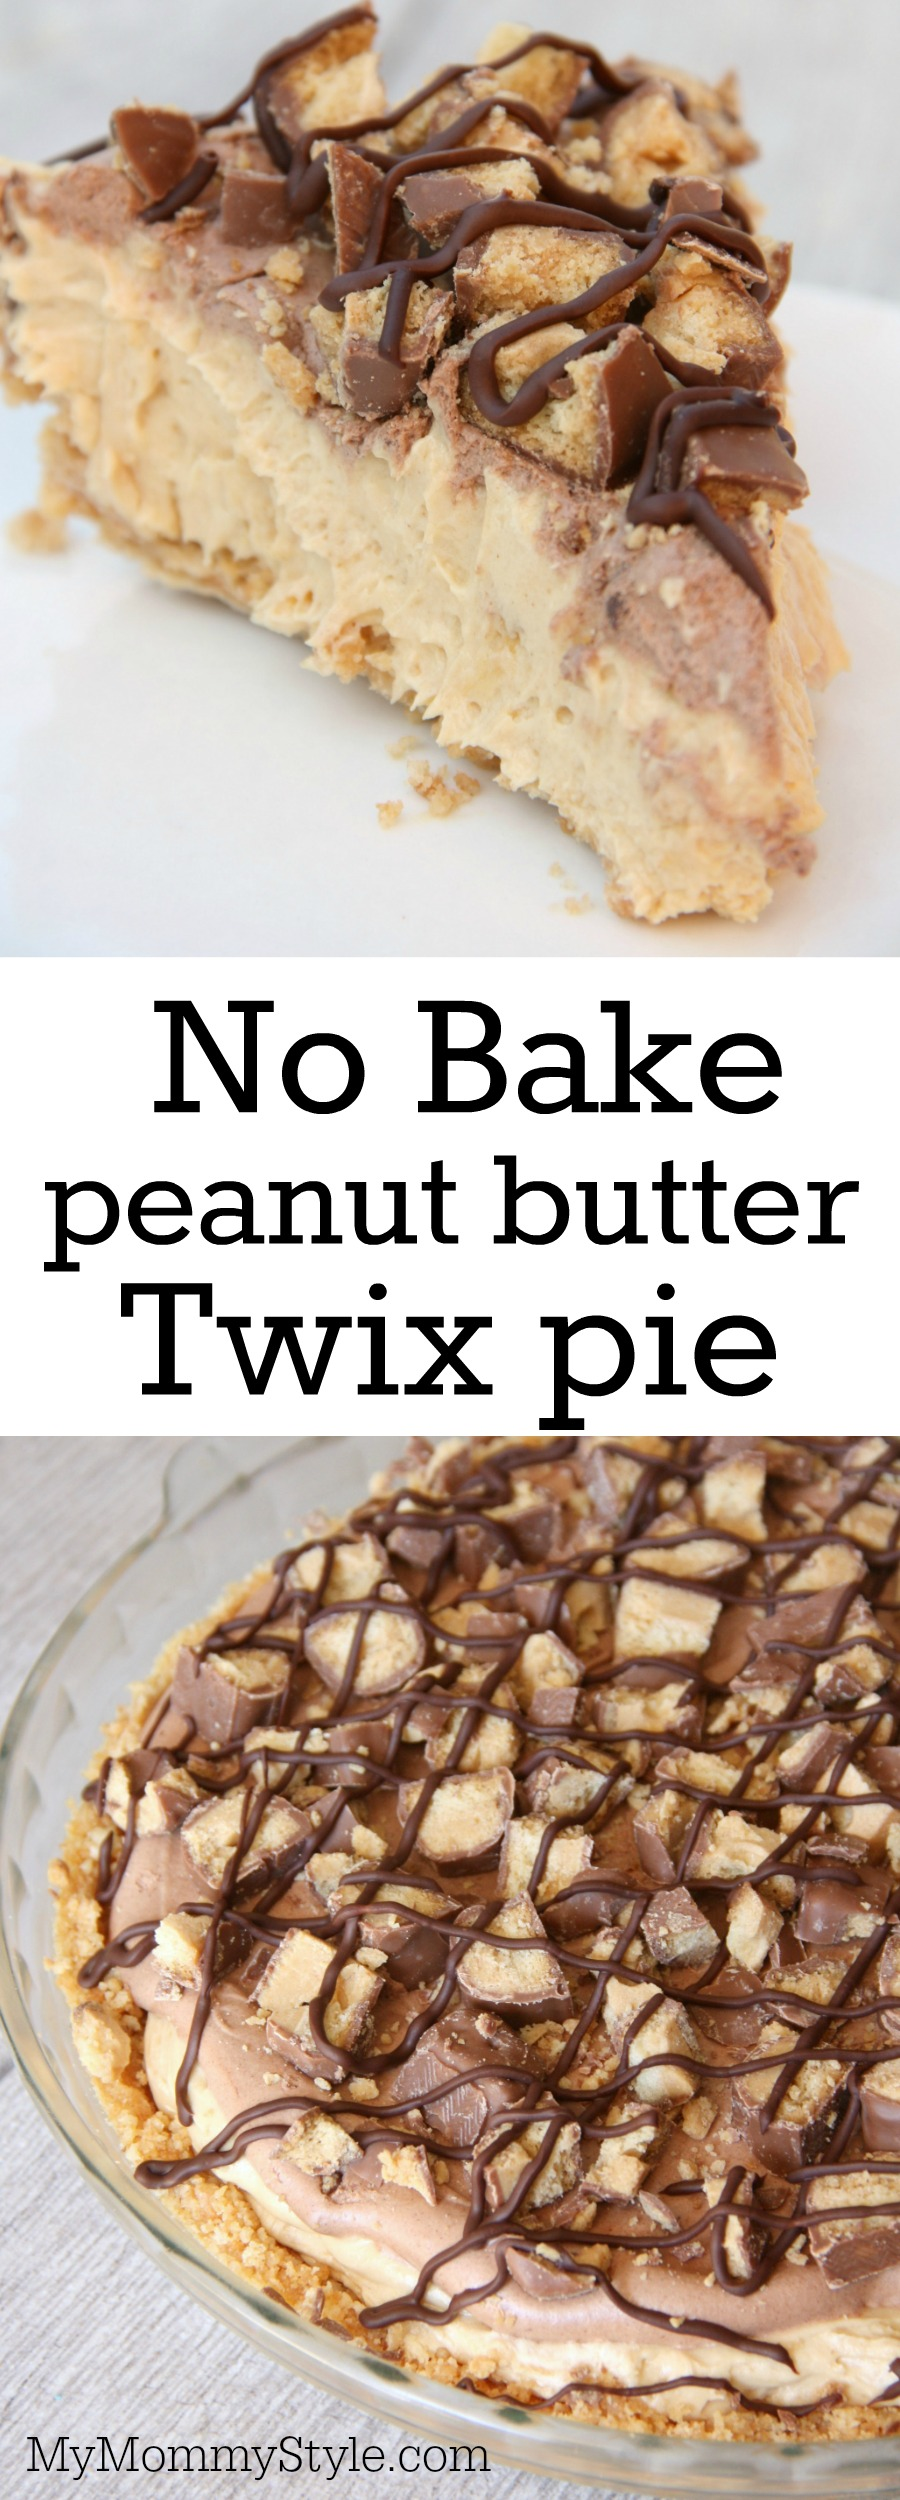 No-Bake Peanut butter Twix pie - My Mommy Style